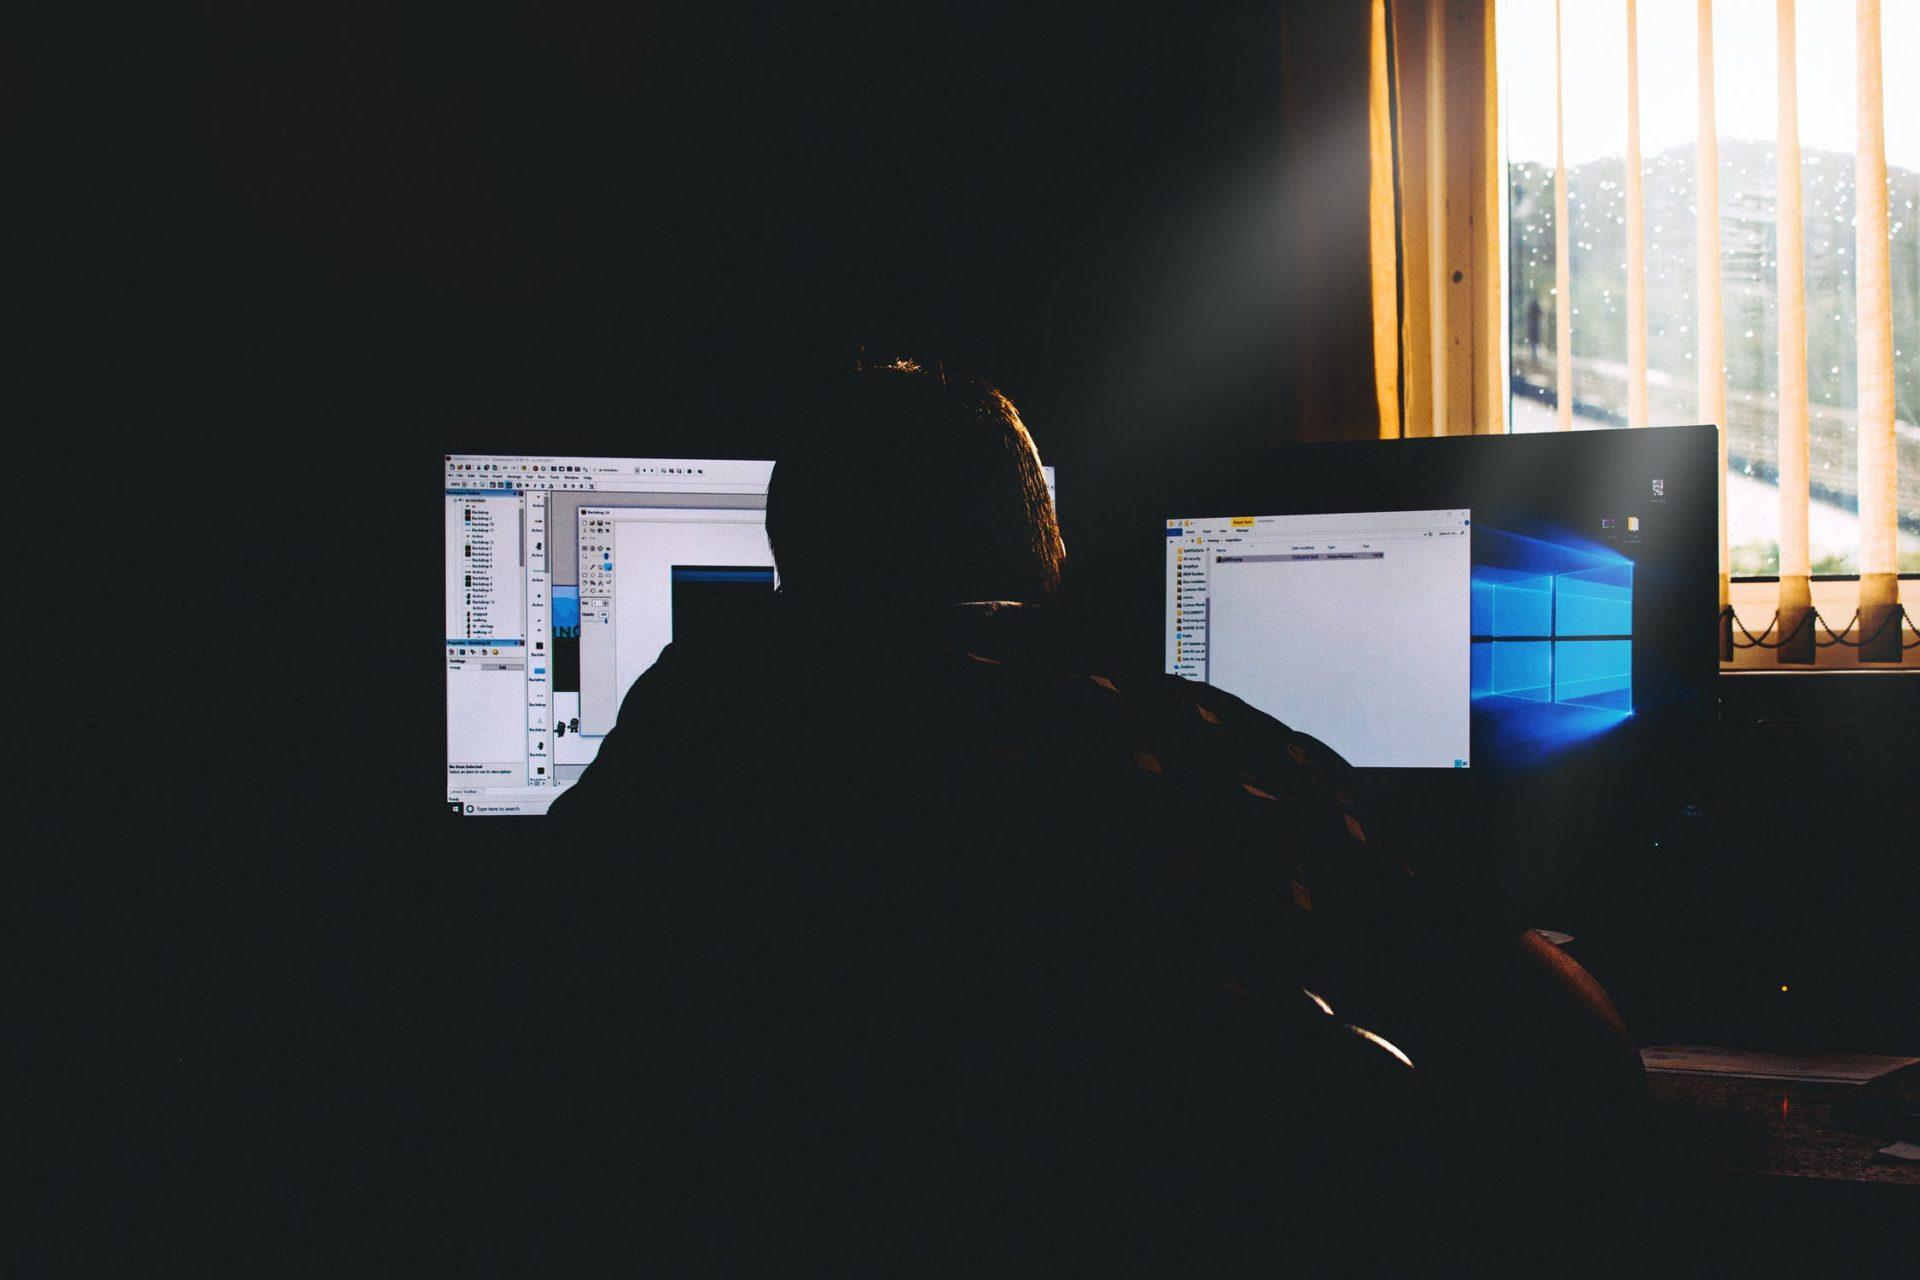 Man sat in the dark looking at computer